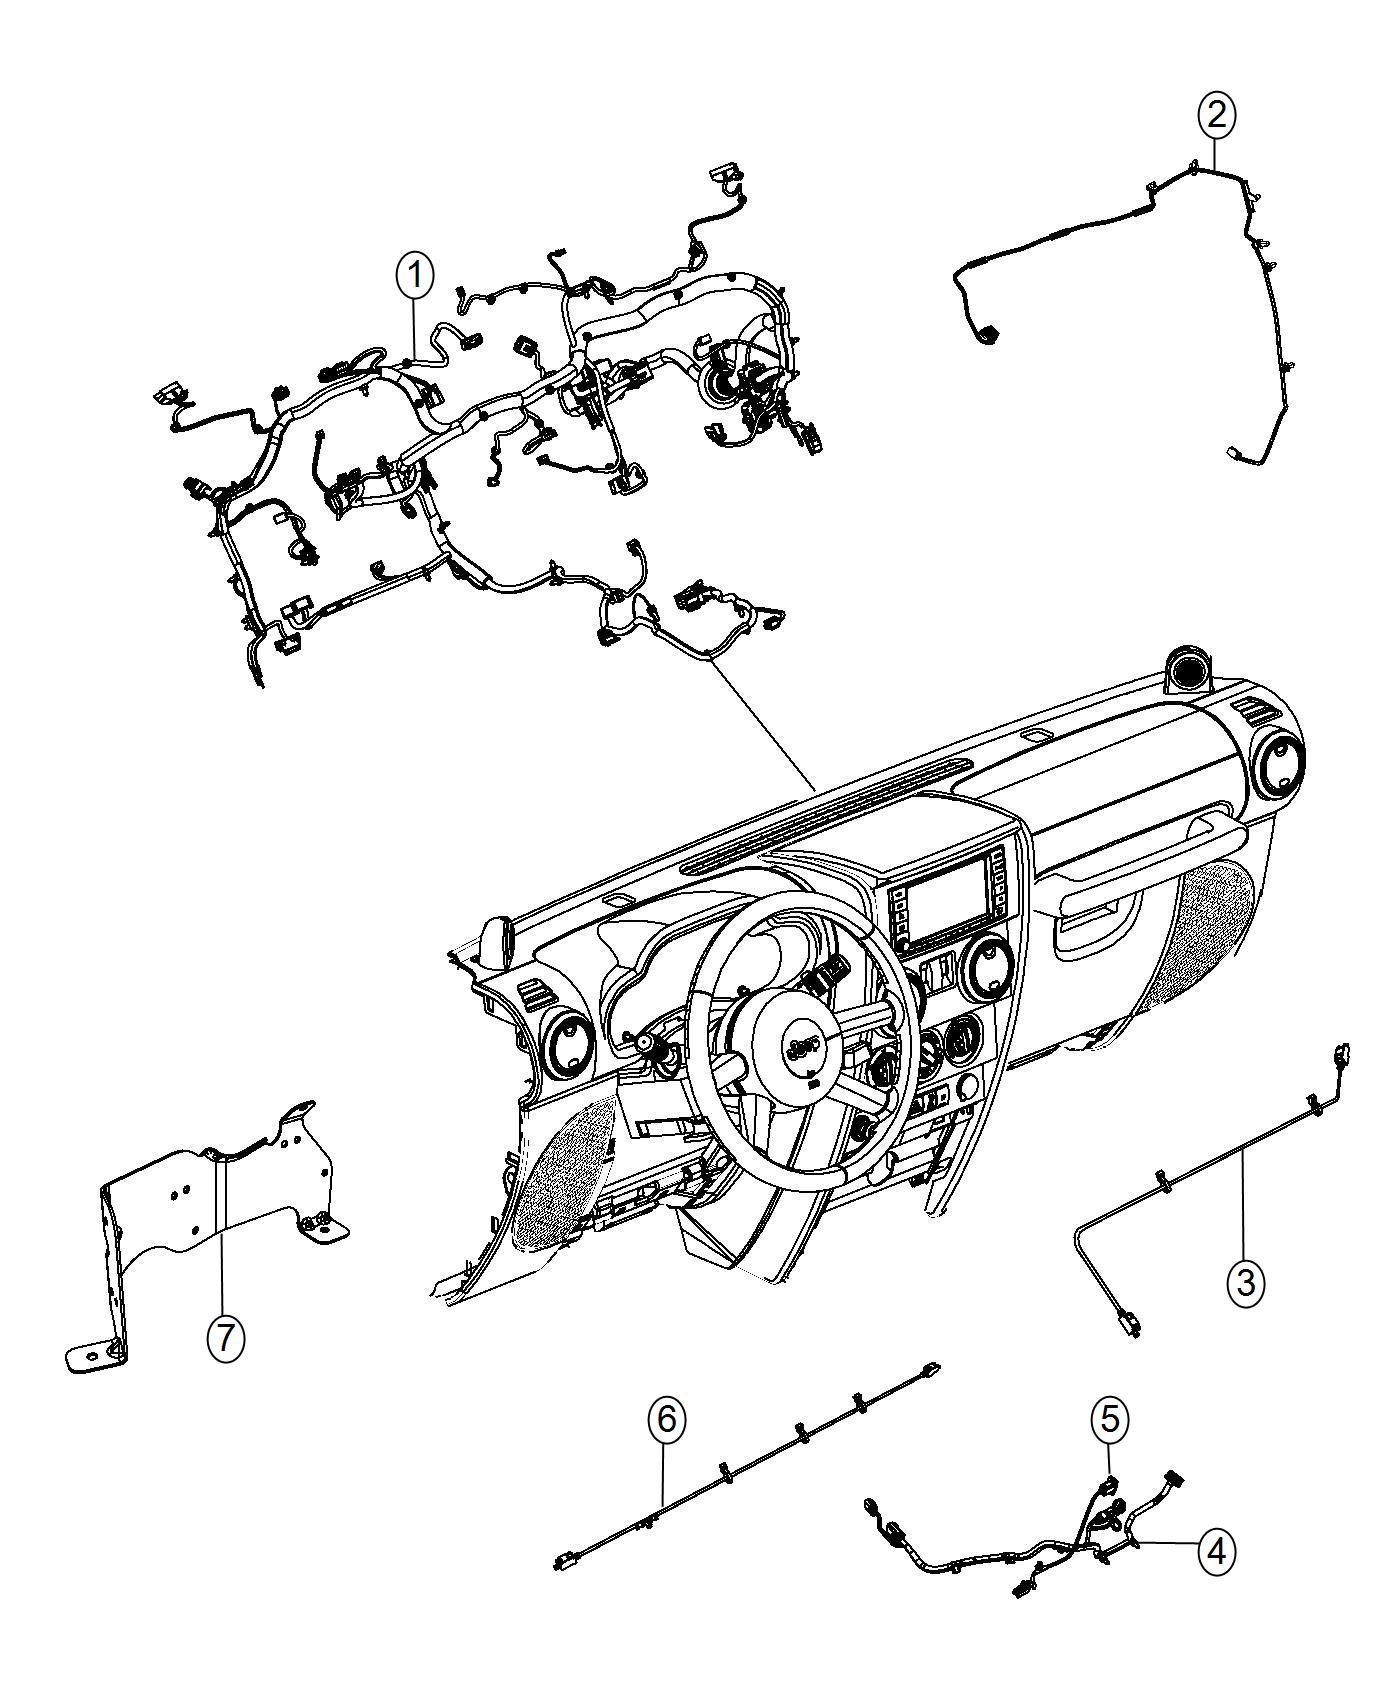 Jeep Wrangler Wiring  Instrument Panel  Export  Down